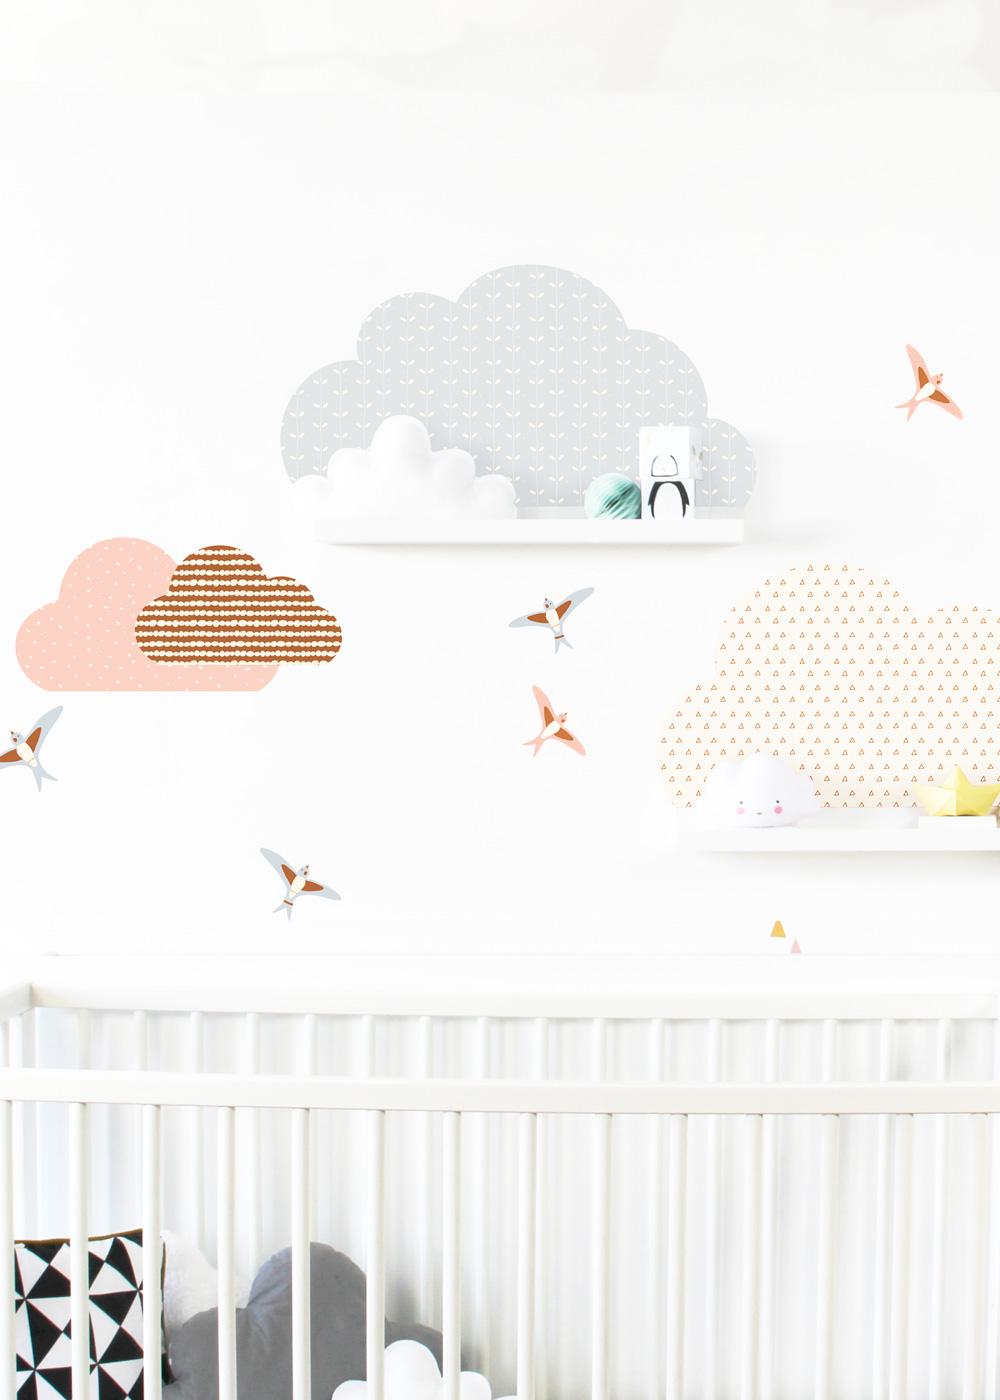 Ikea Mosslanda Bilderleiste Musta Wolken rose camel Gesamtansicht